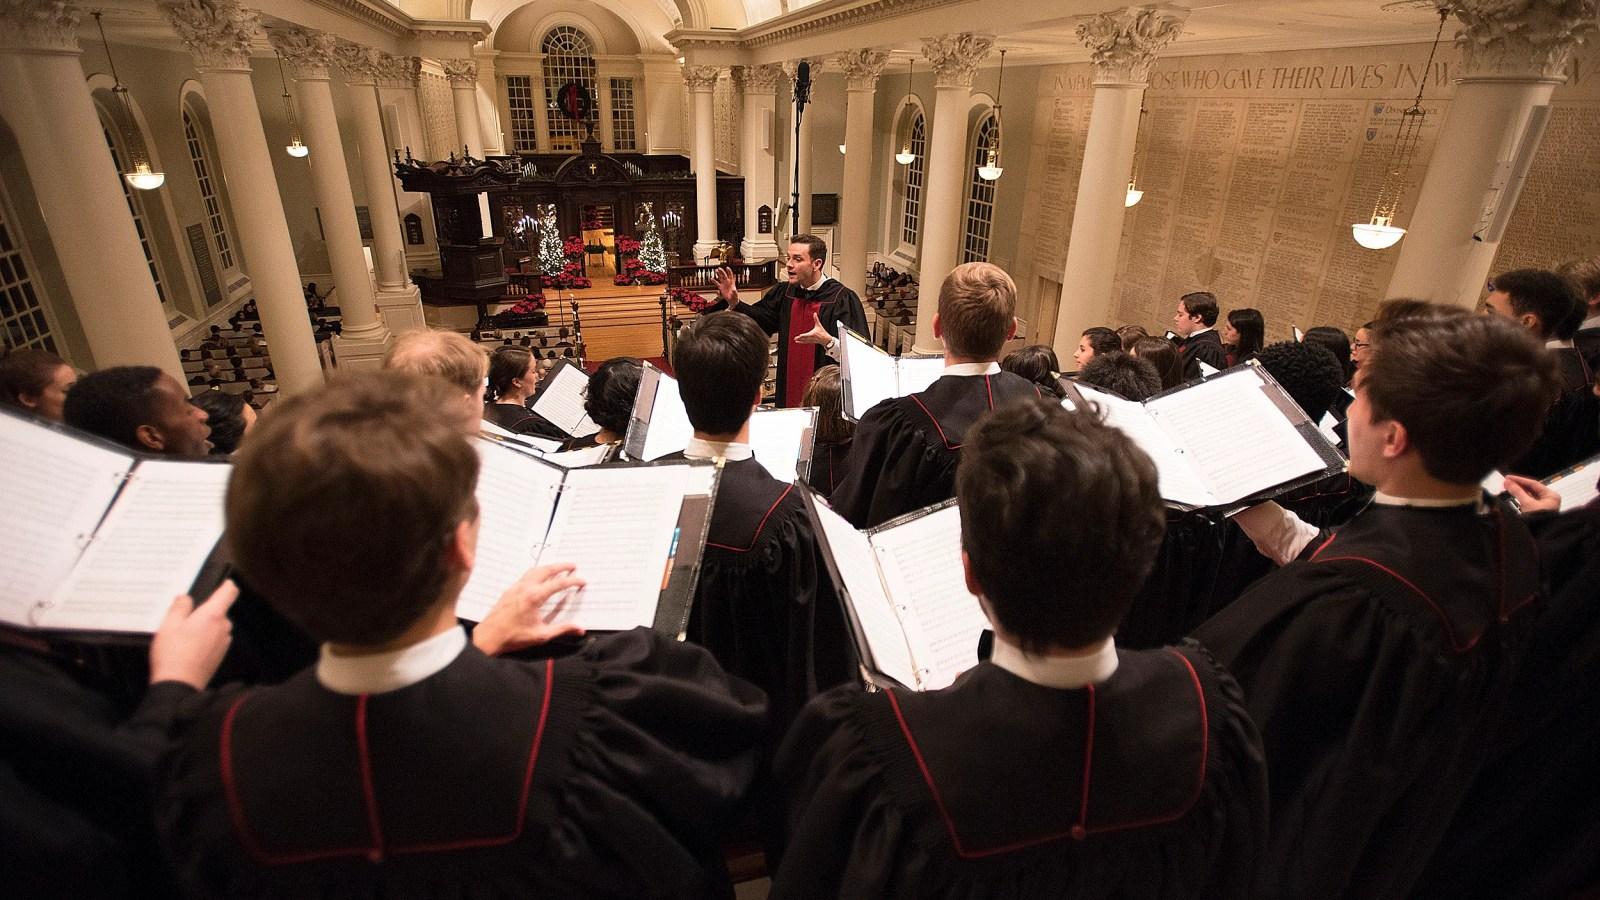 Christmas carol tradition returns to renovated Memorial Church ...